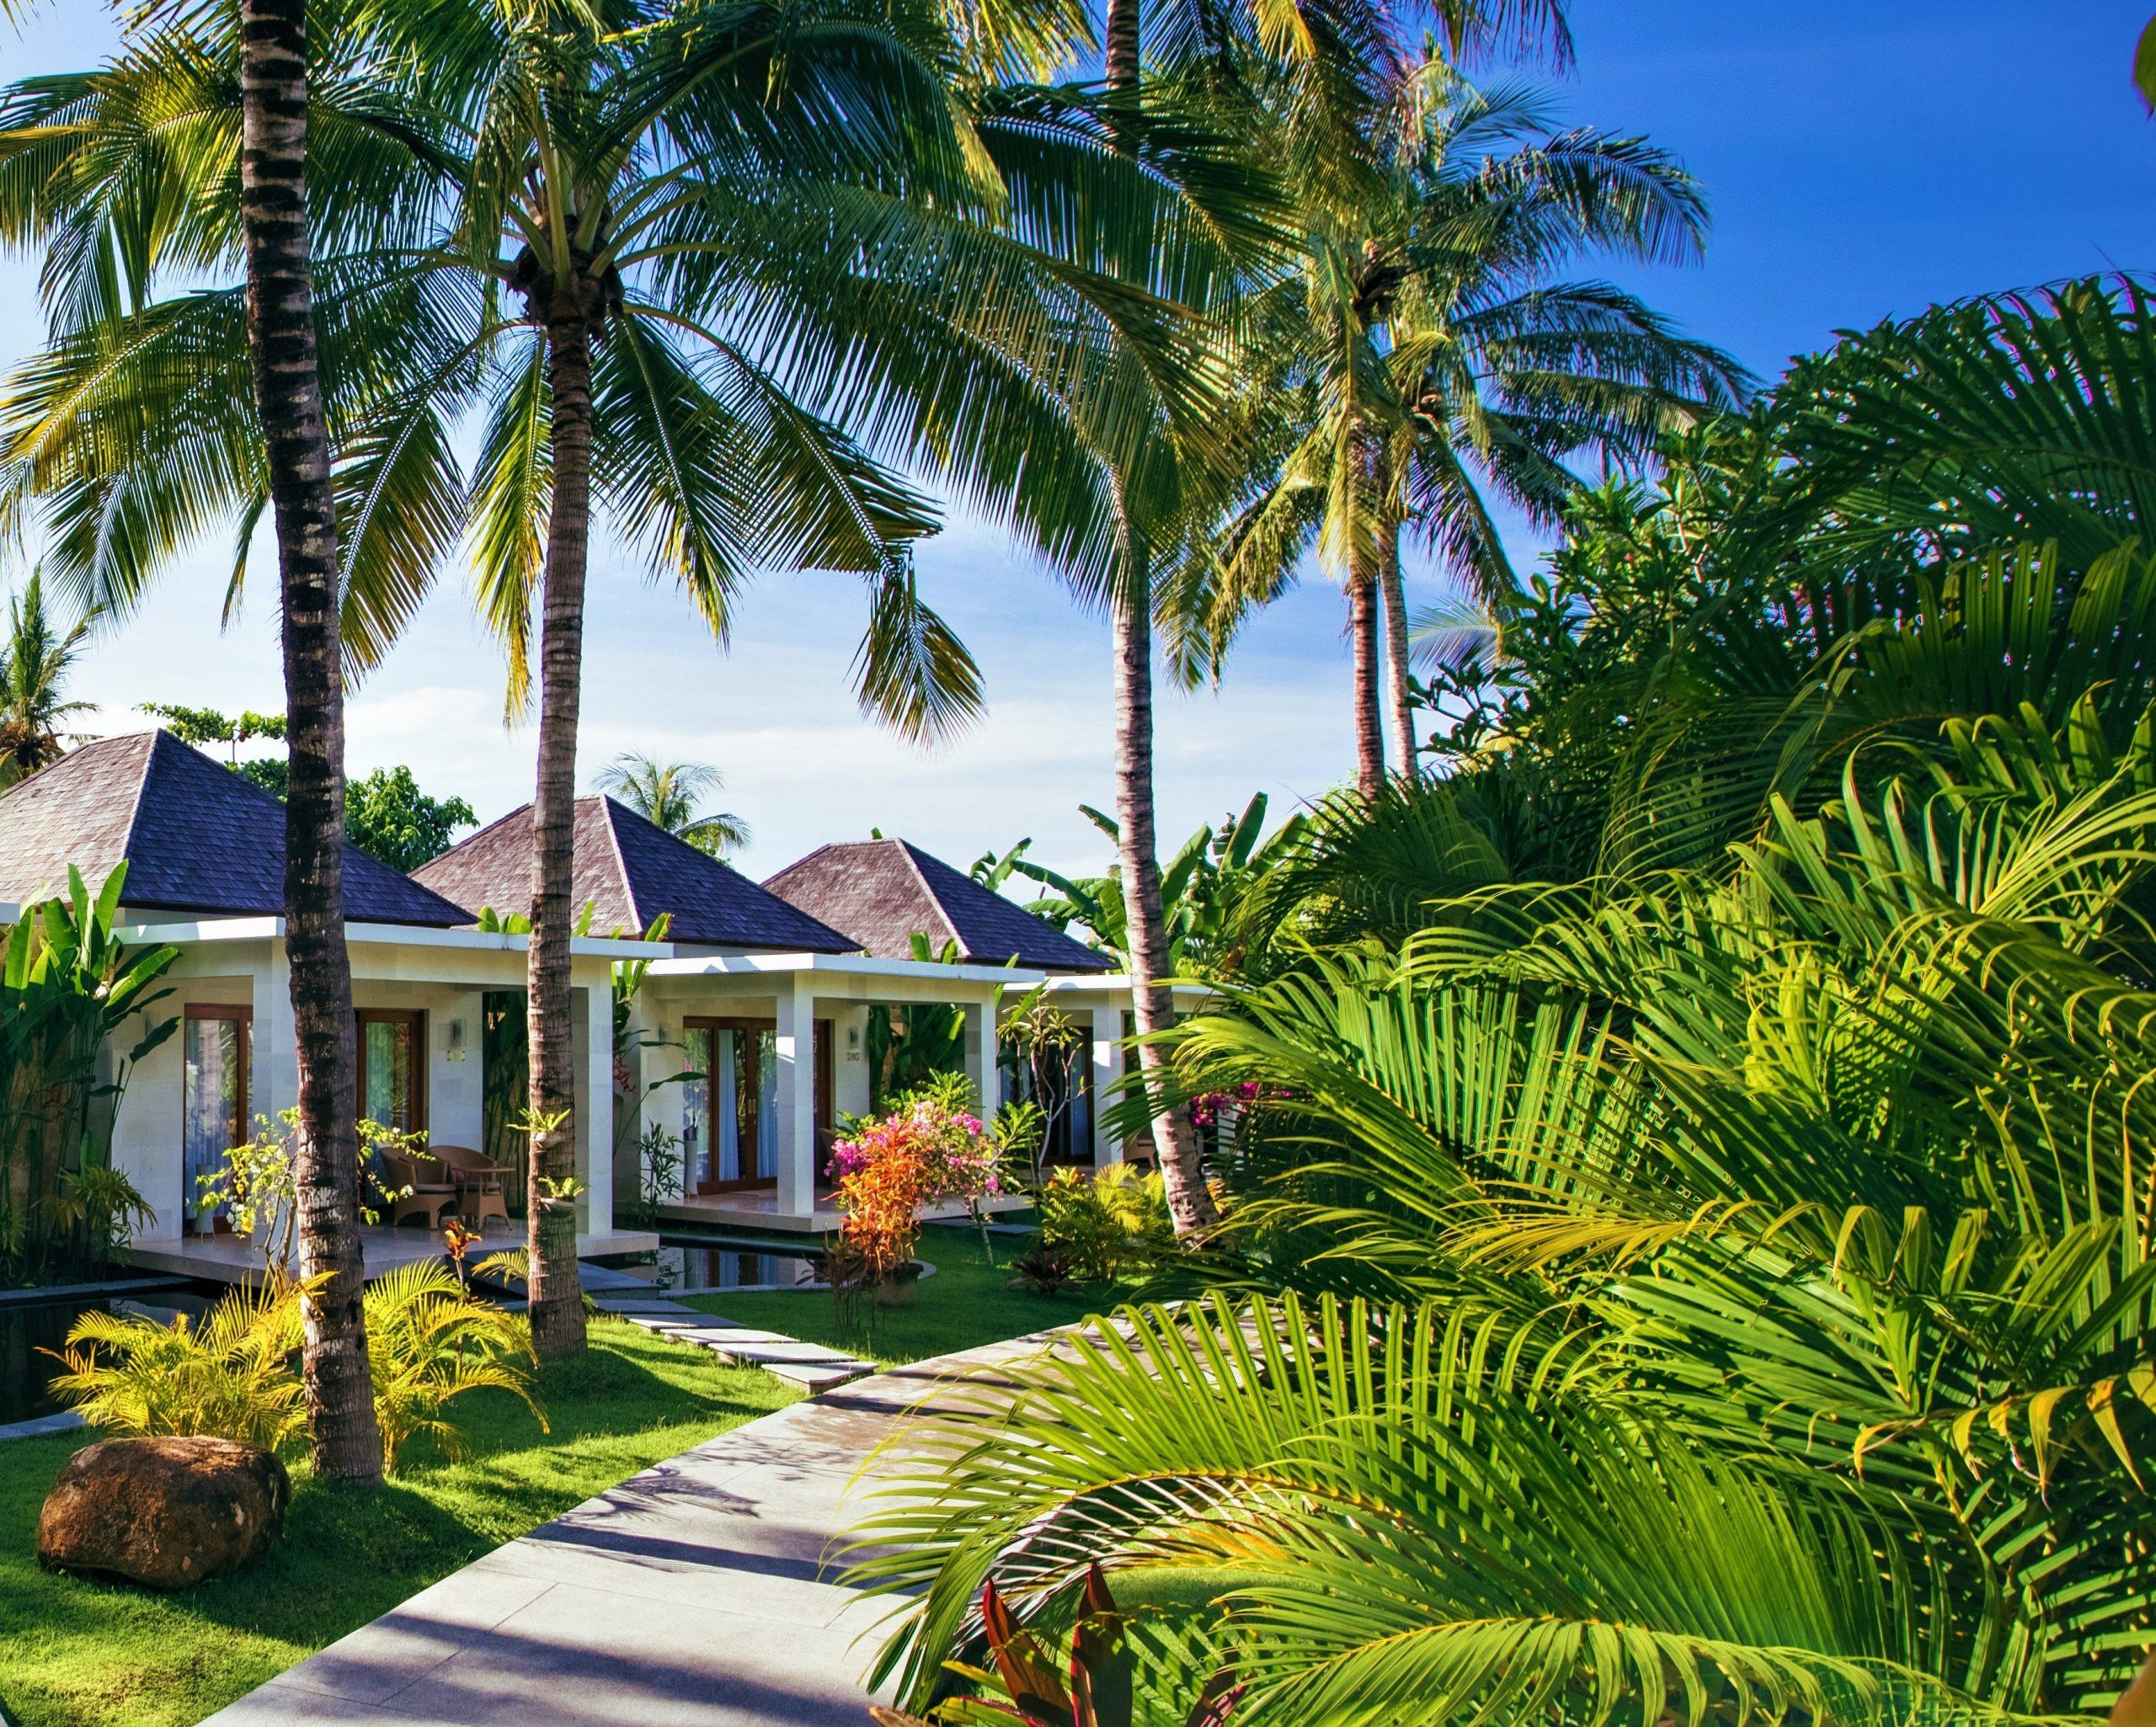 Luxury resort Kuta Lombok